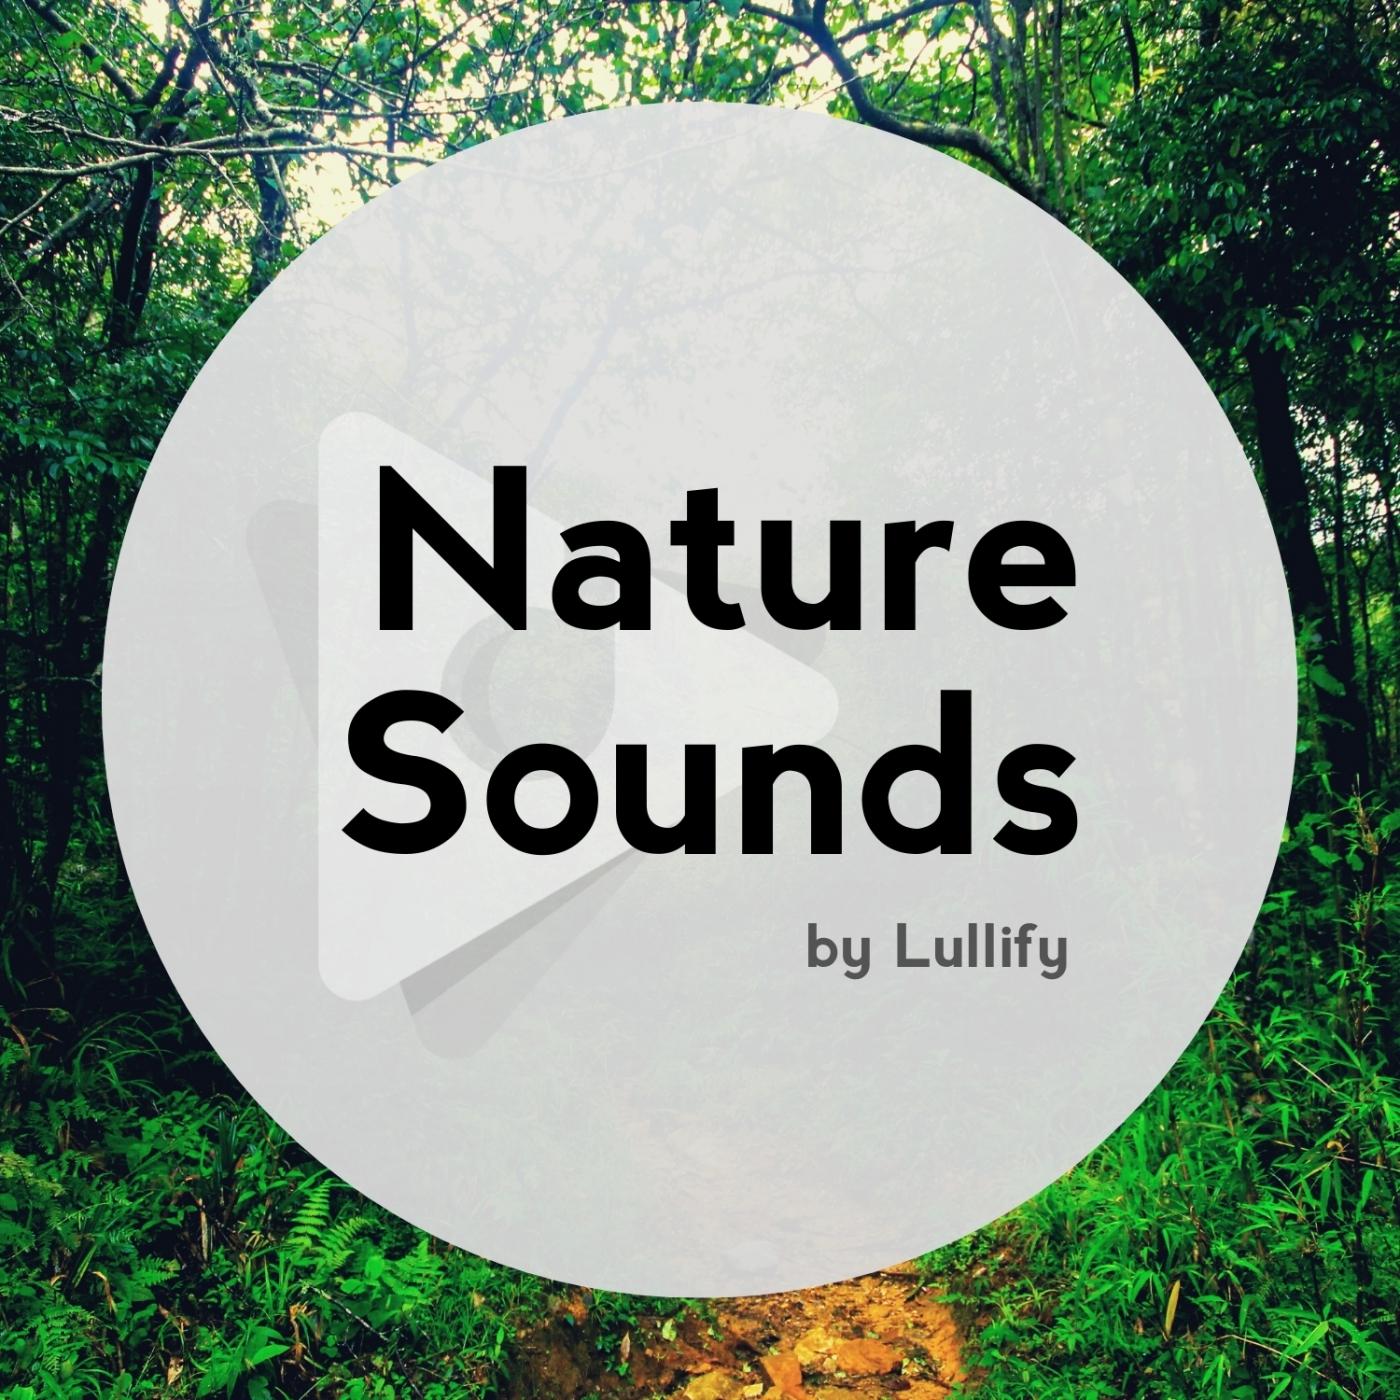 Nature Sounds by Lullify